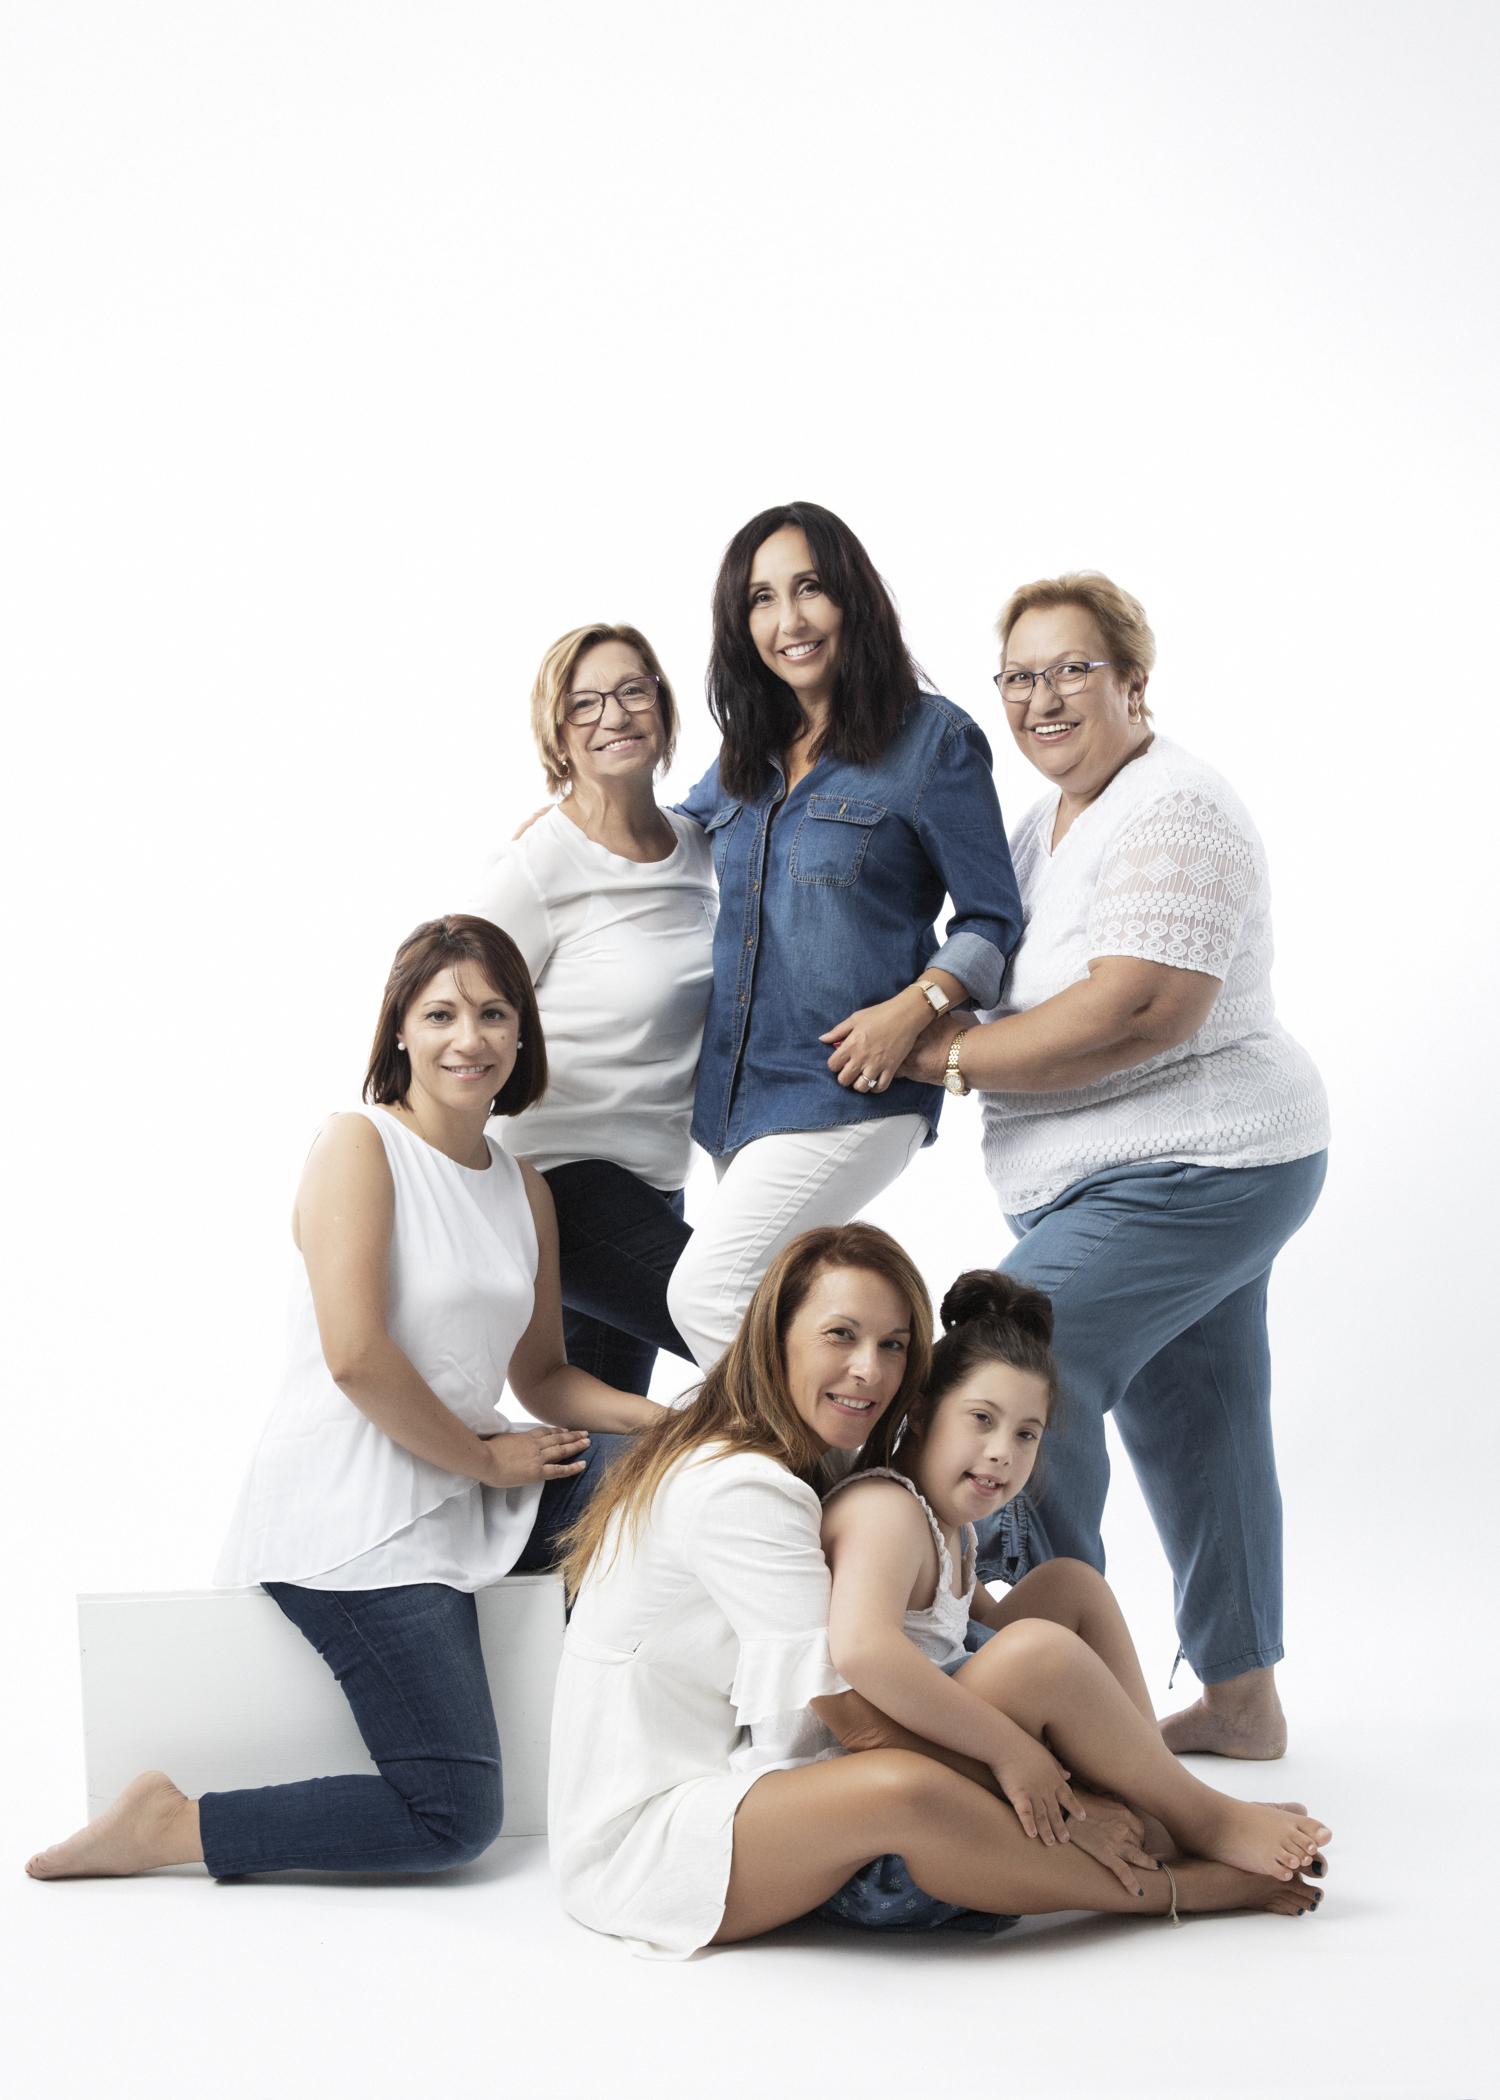 5X7%22 Minilab Lustre Generations Latinas10Analia Paino Portrait Photography.jpg